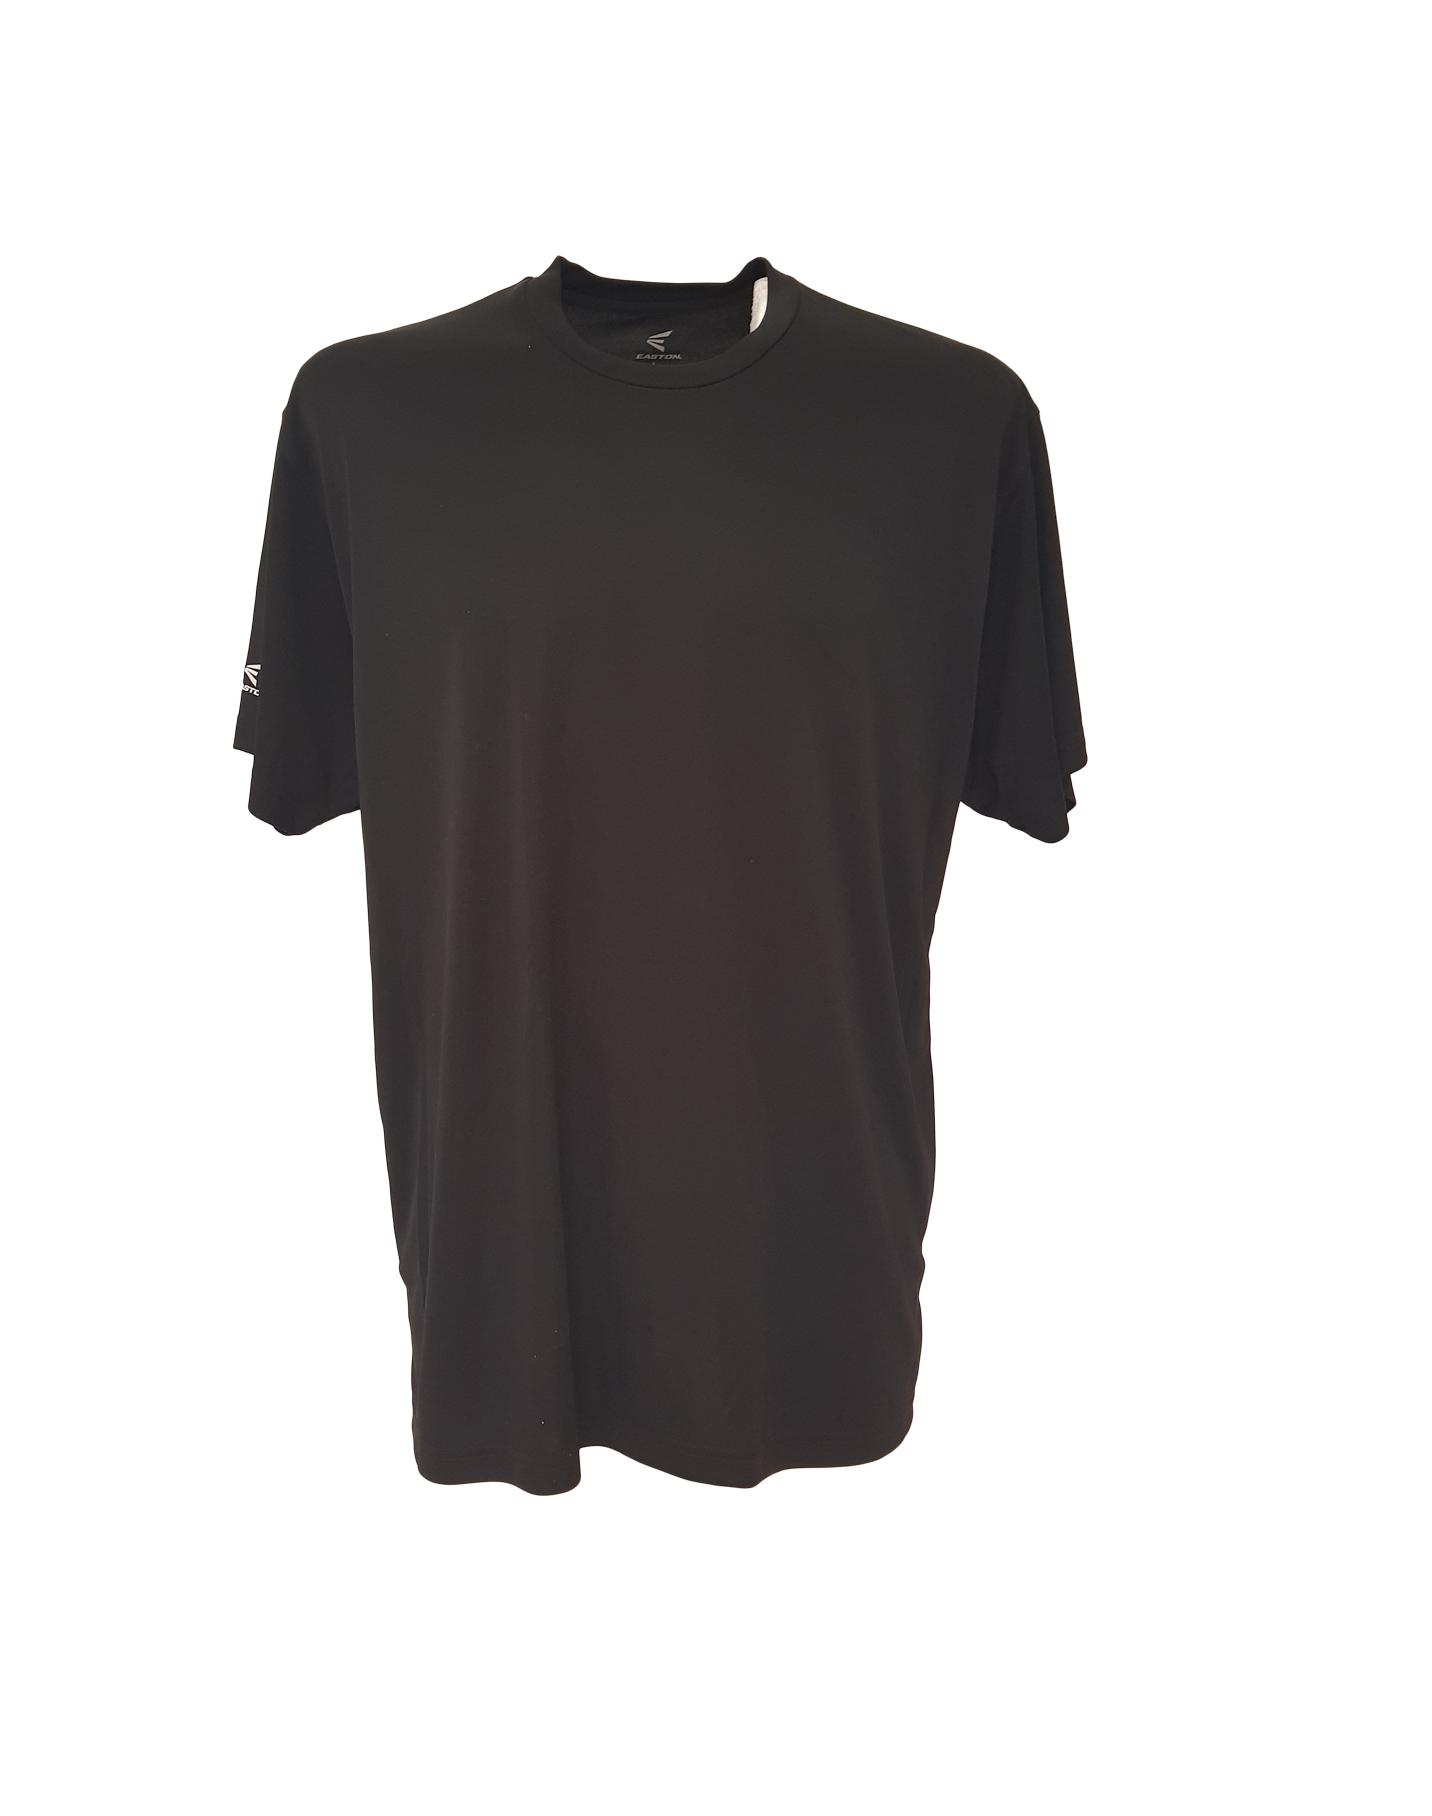 Easton Adult T-Shirt